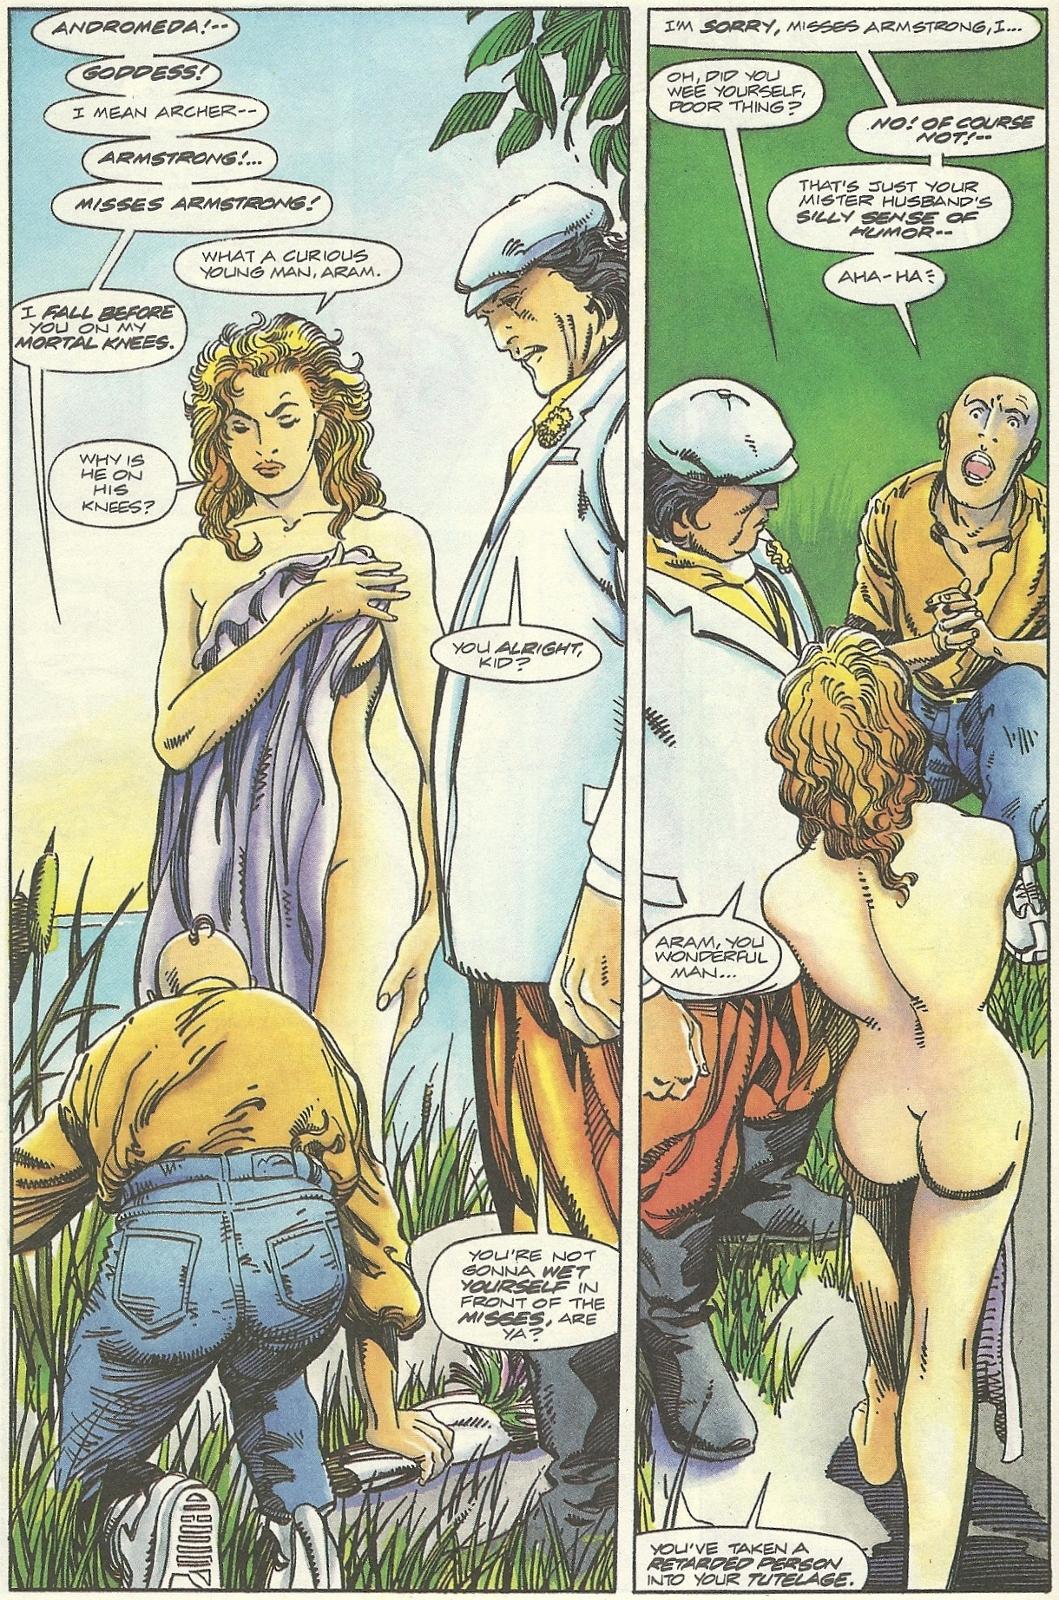 Naked mrs marvel apologise, but